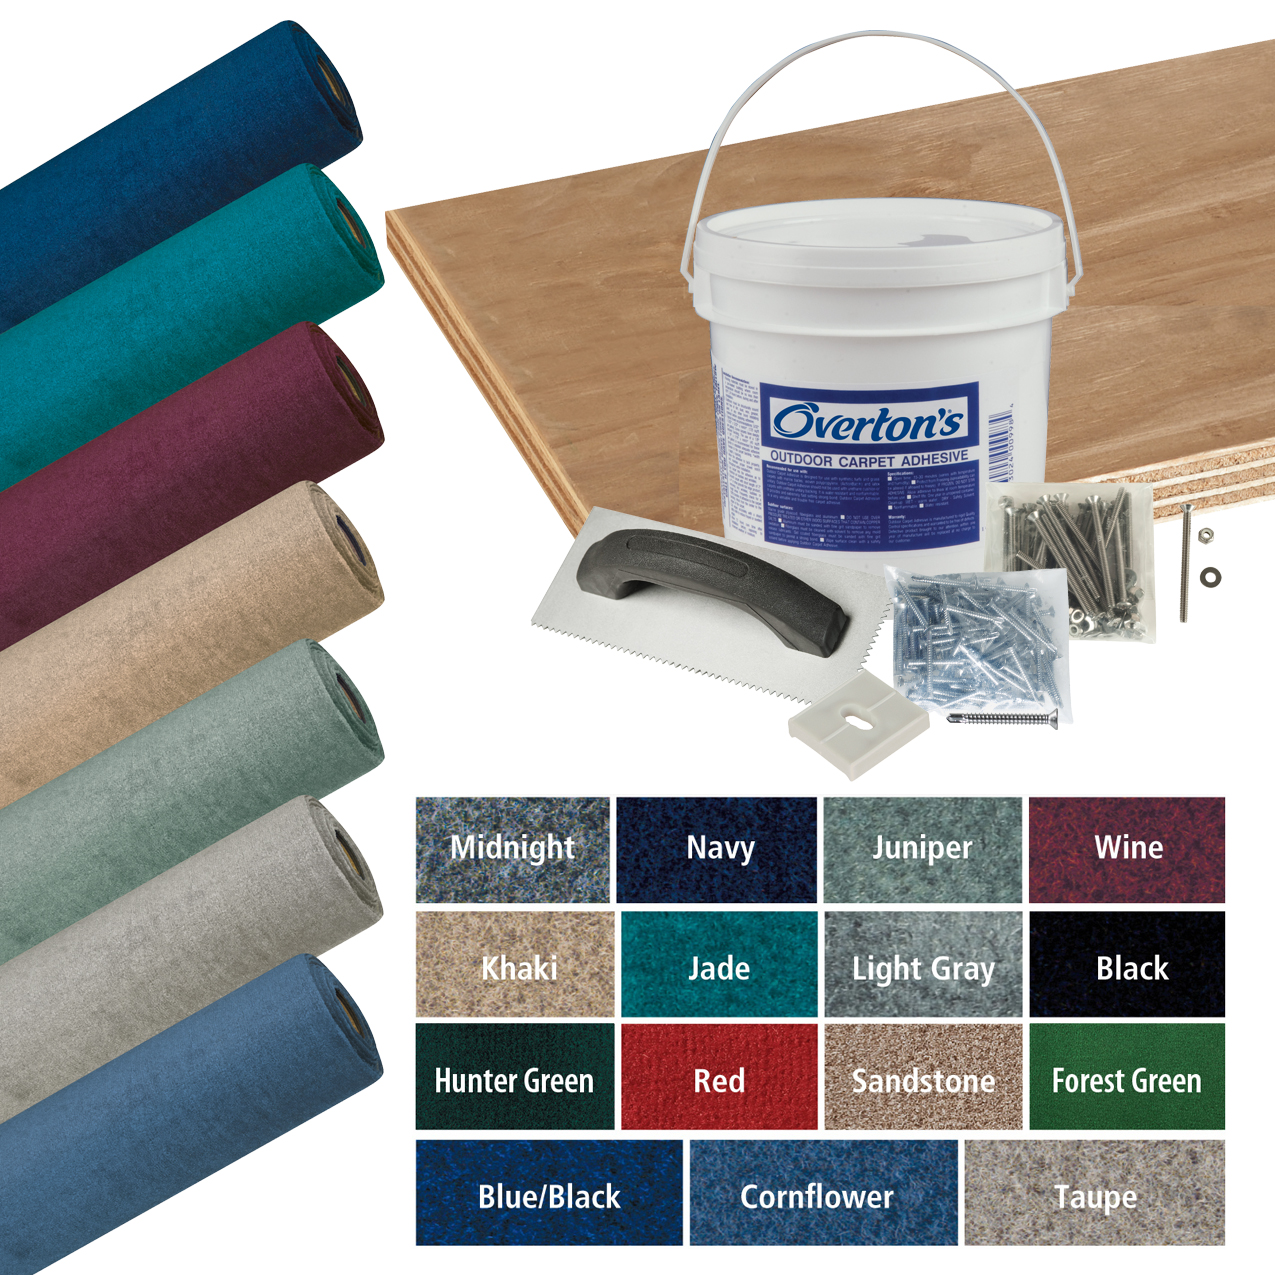 Overton's Daystar Carpet and Deck Kit, 8.5'W x 16'L